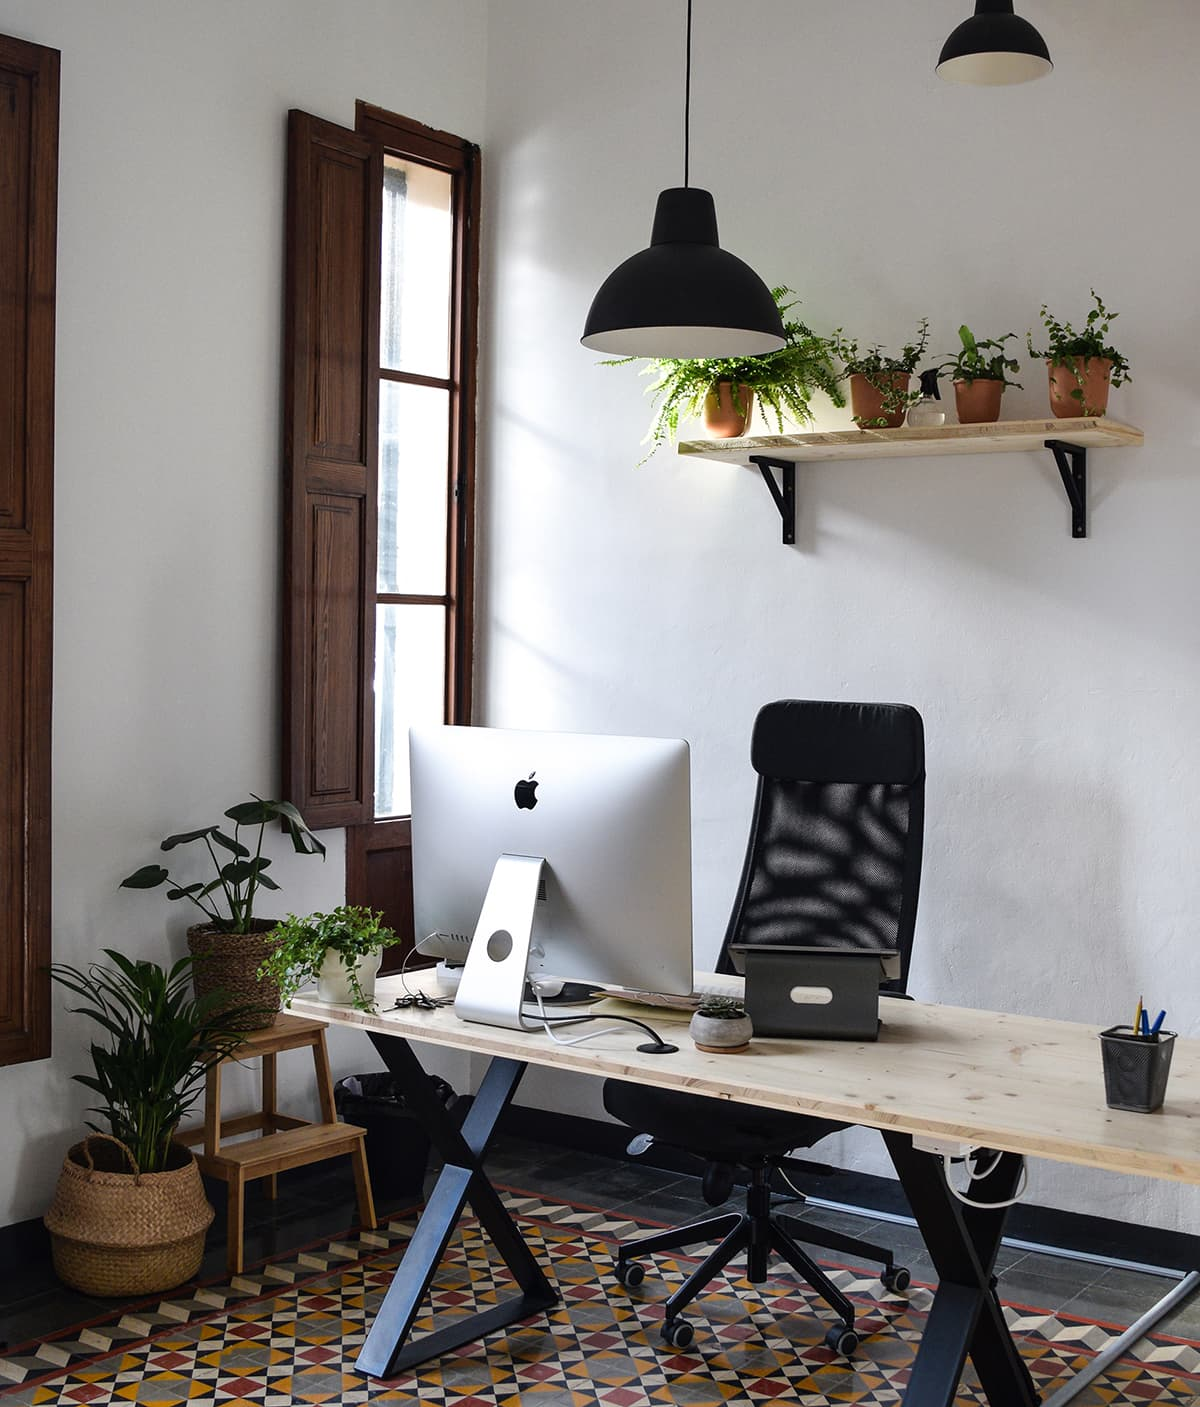 Ancar Studio Oficina Mallorca